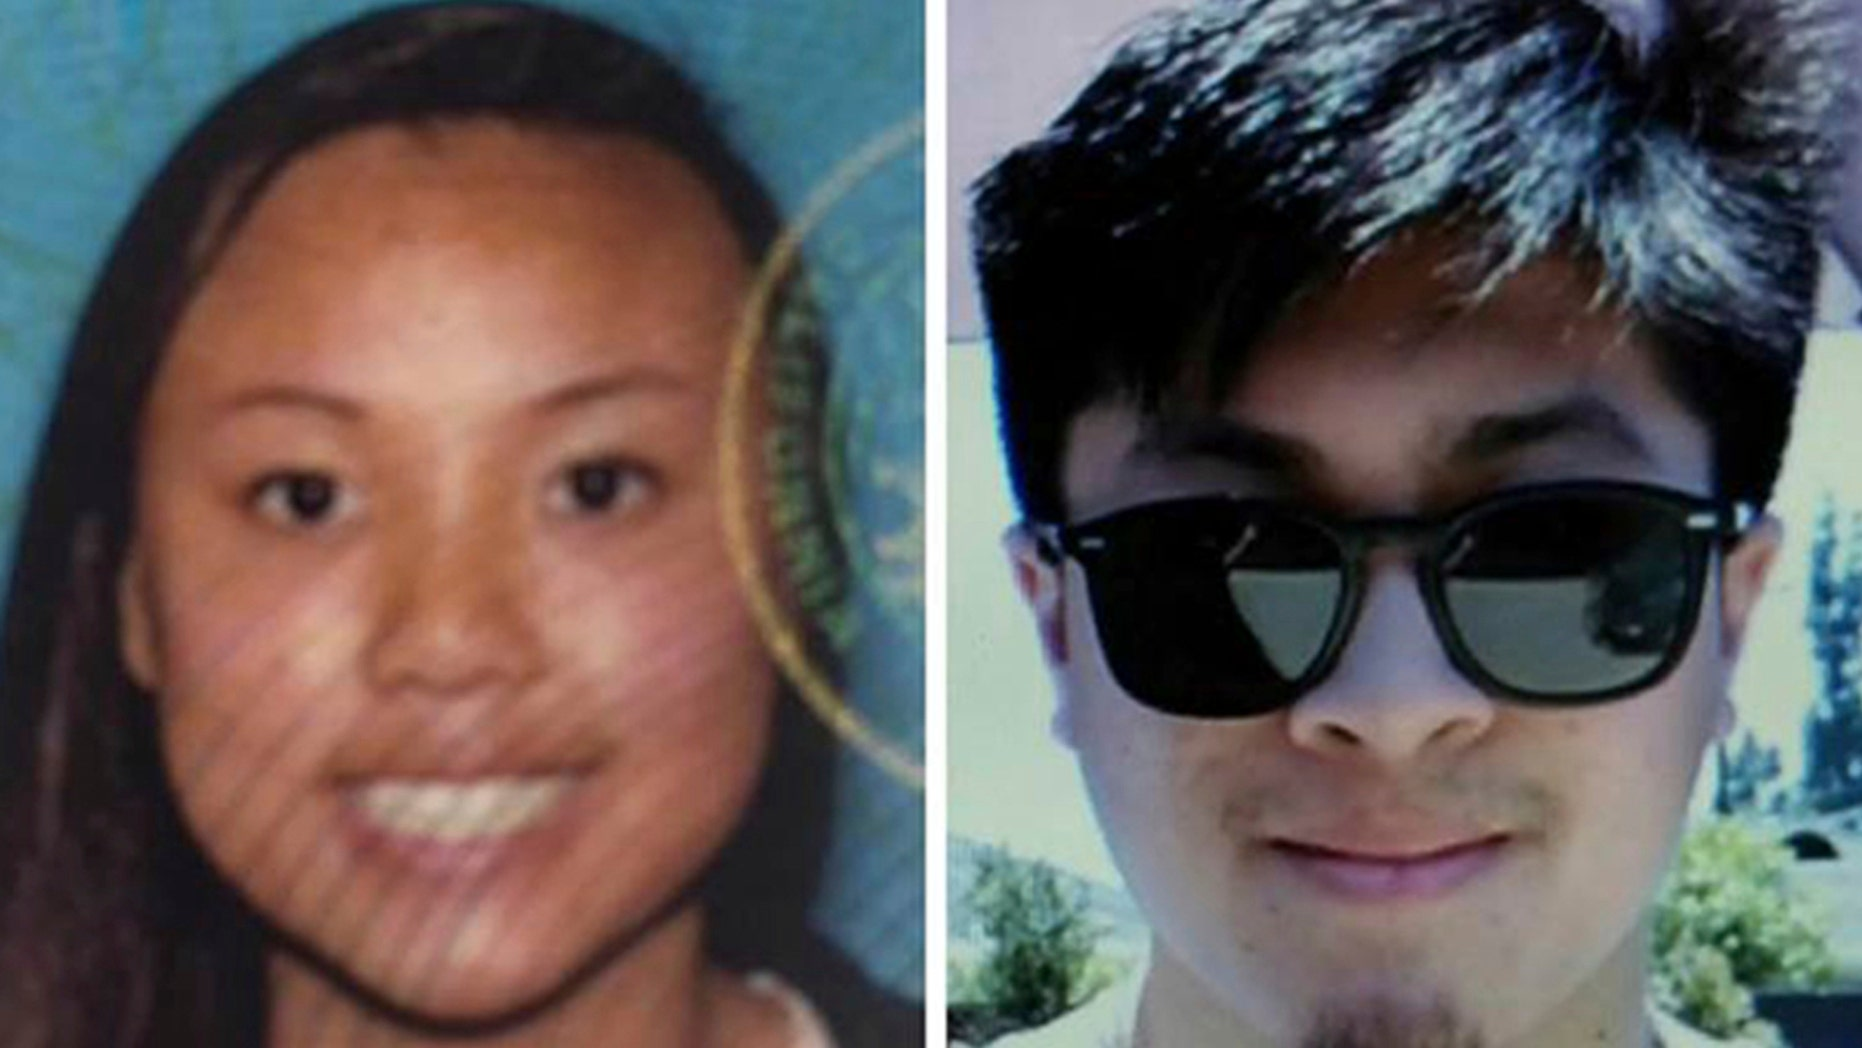 Investigators say Joseph Orbeso, right, shot and killed Rachel Nguyen in Joshua Tree National Park before turning the gun on himself